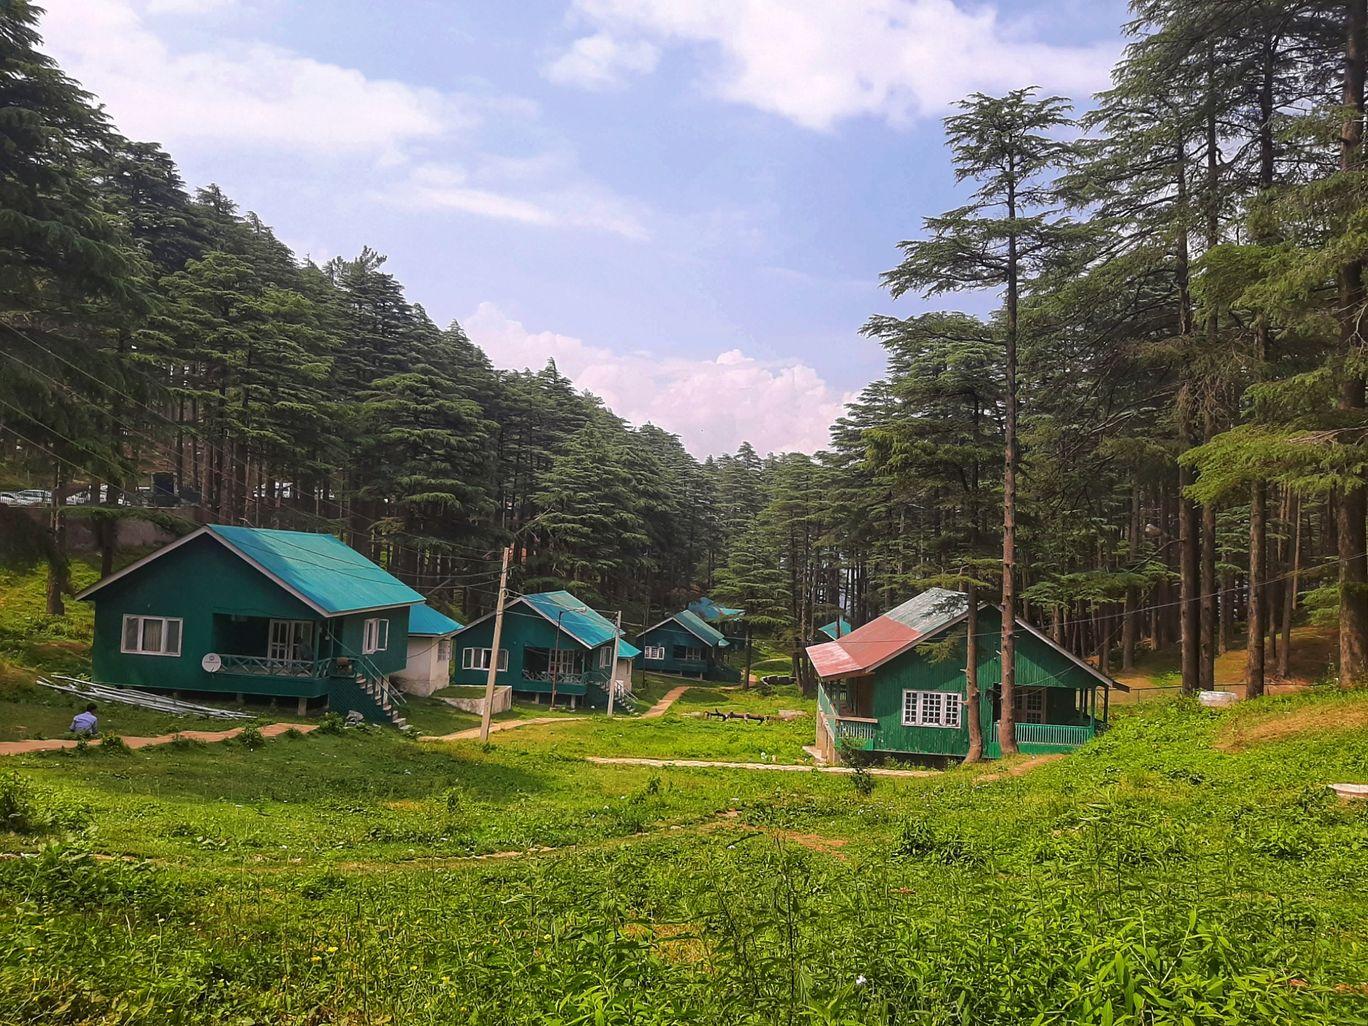 Photo of Patni Top Park By Amardeep Srivastava